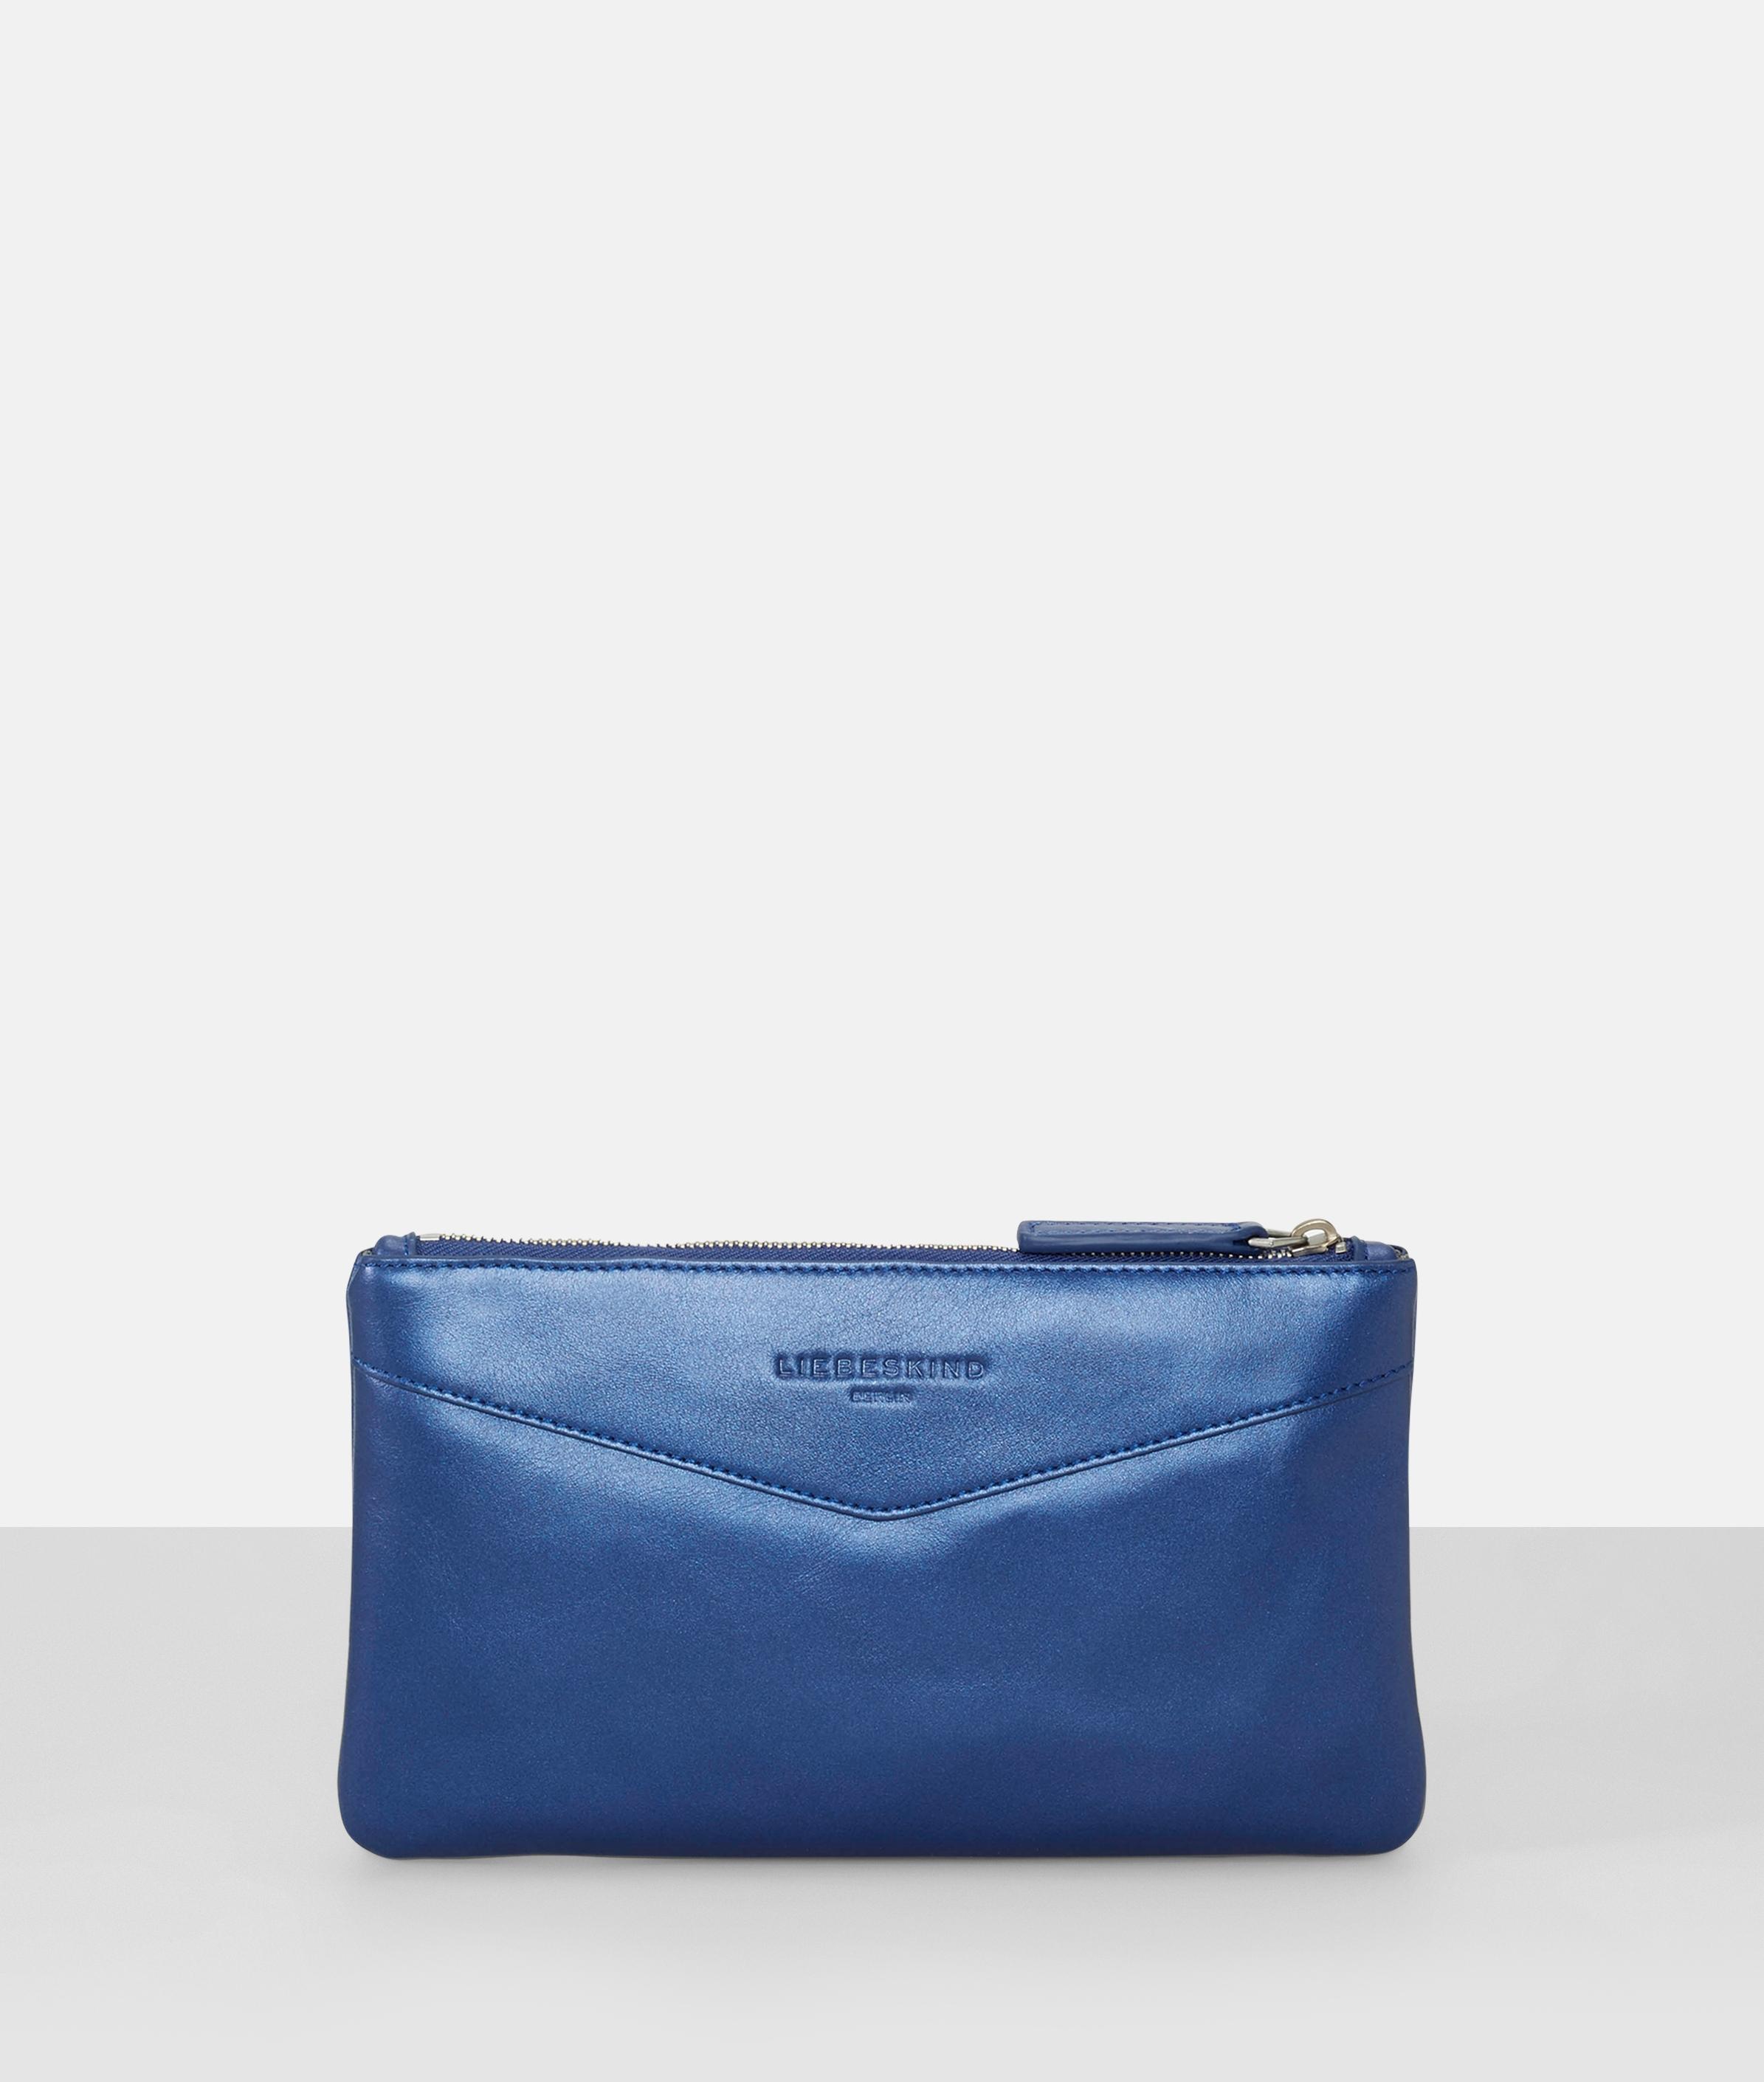 Berlin Tasche Cecily, Blau